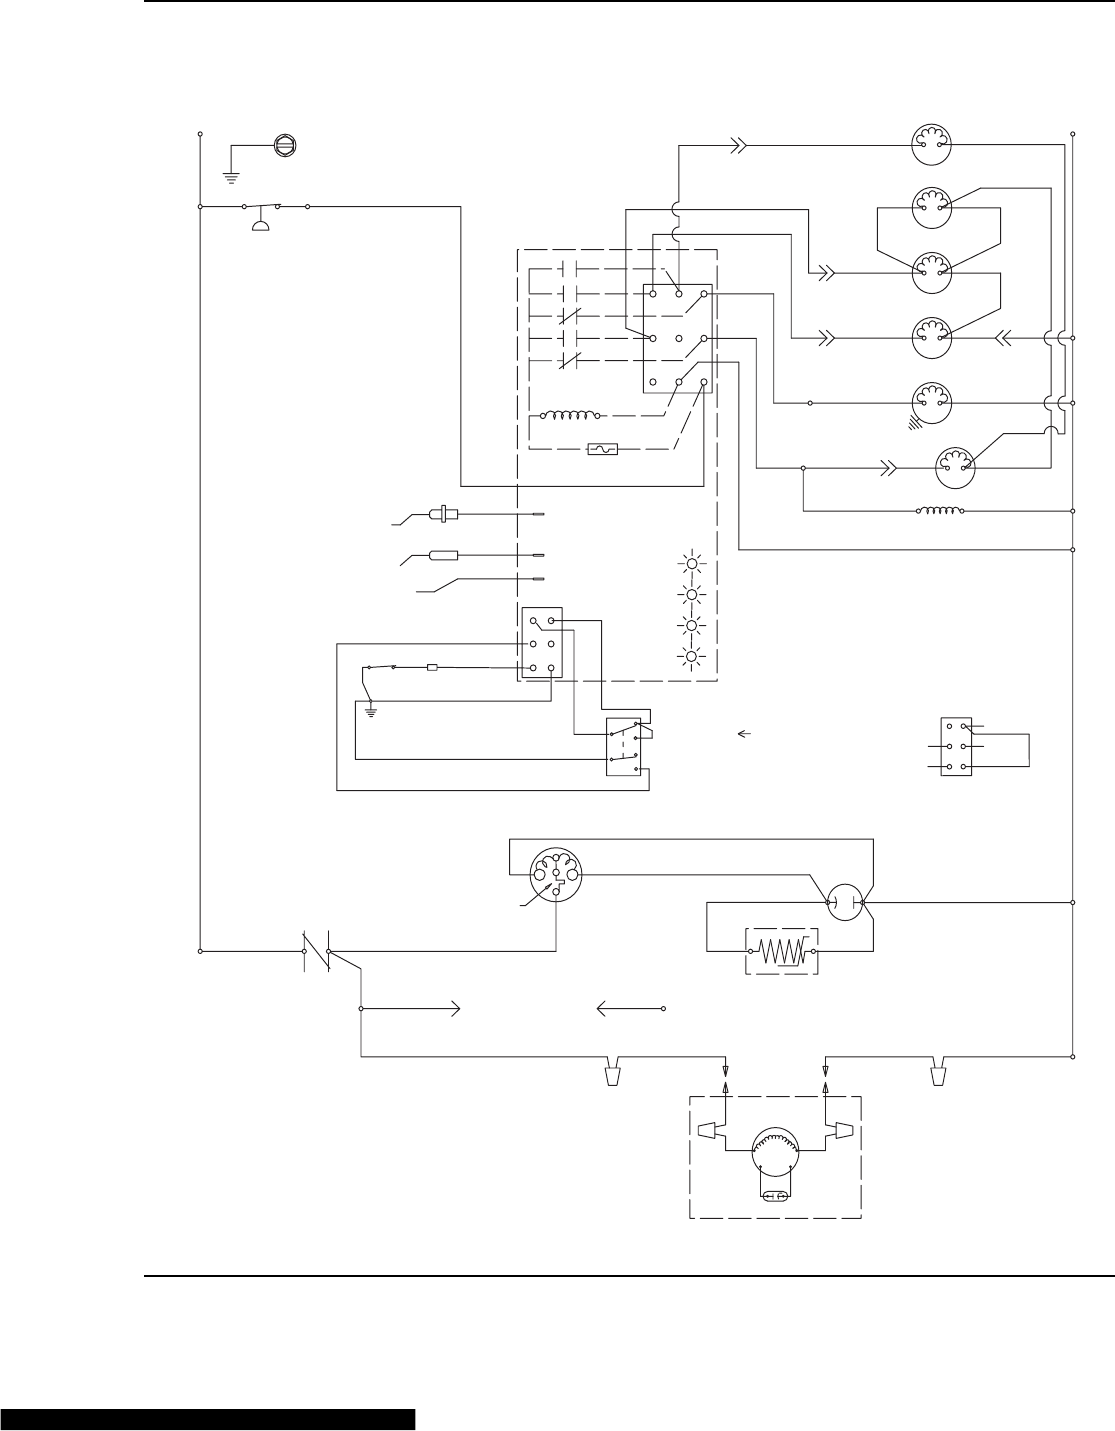 3 Way Switch Wiring Amana Ice Maker Wiring Diagram Hd Quality Sohn Lintreccio It